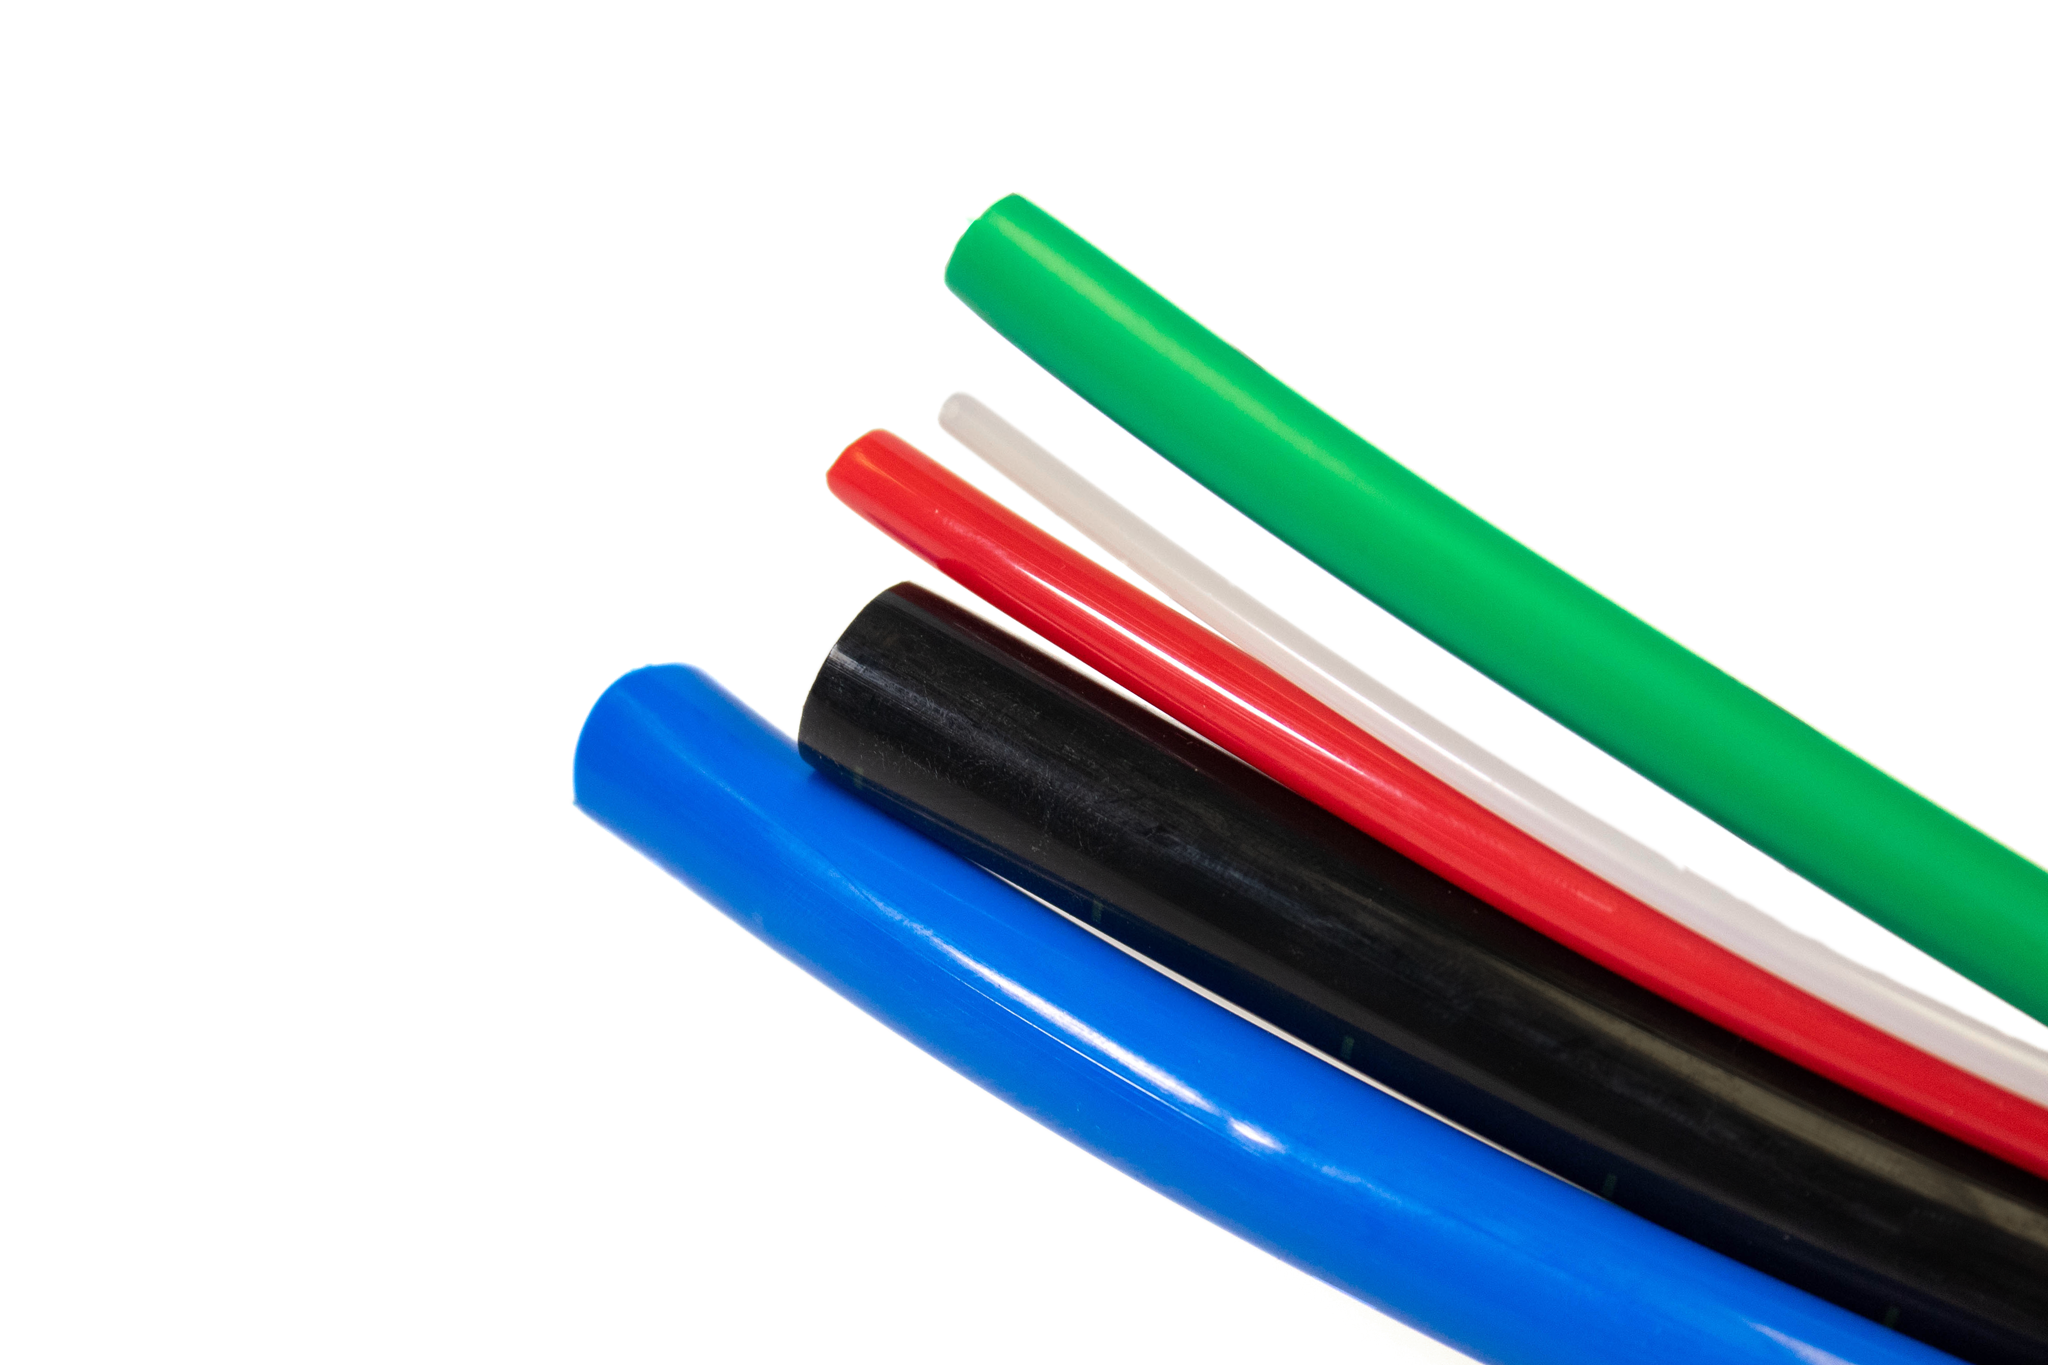 Flexible Nylon Hose Tubing Thin Wall 5.0mm O/D x 3.0mm I/D x 1.0mm Wall Blue